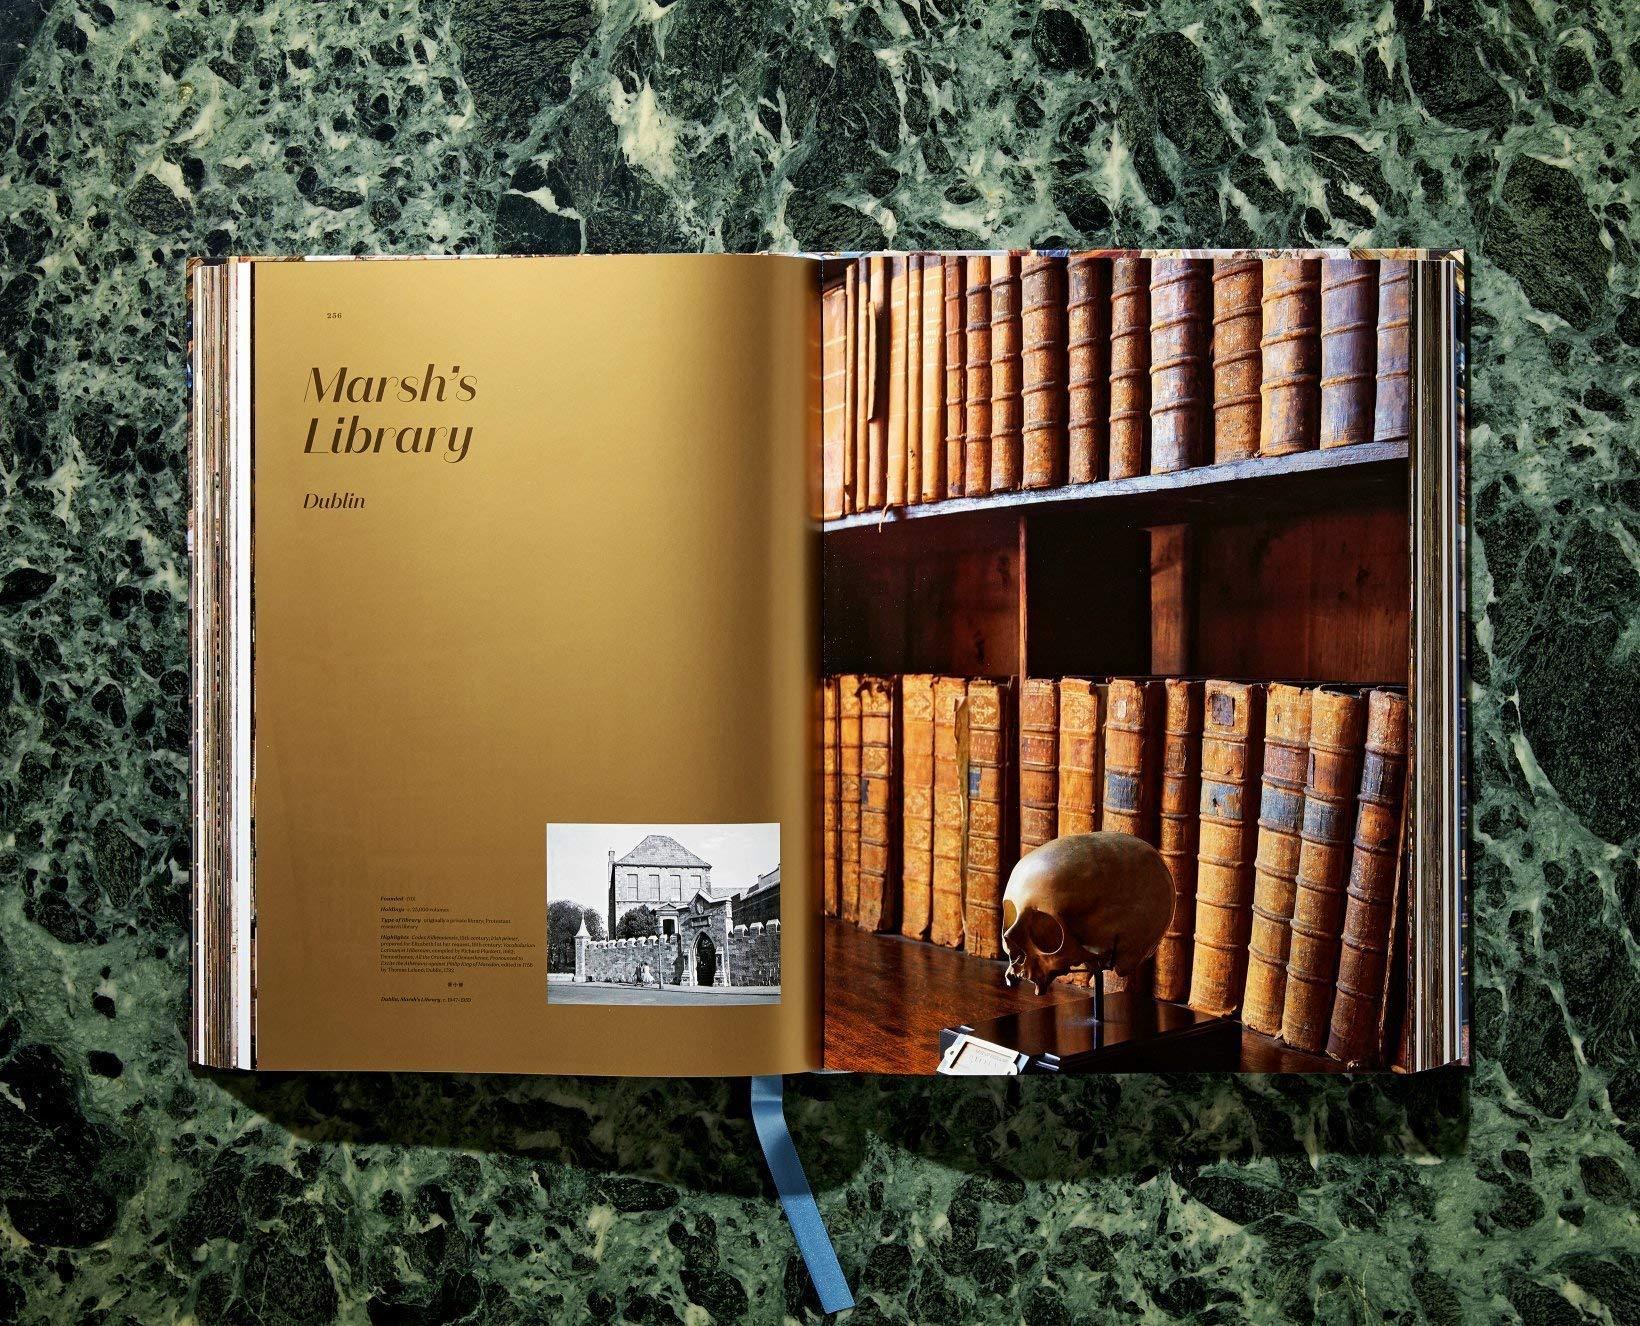 Massimo Listri. The Worlds Most Beautiful Libraries: LISTRI, LIBRARIES Extra large: Amazon.es: Ruppelt, Georg, Sladek, Elisabeth: Libros en idiomas extranjeros